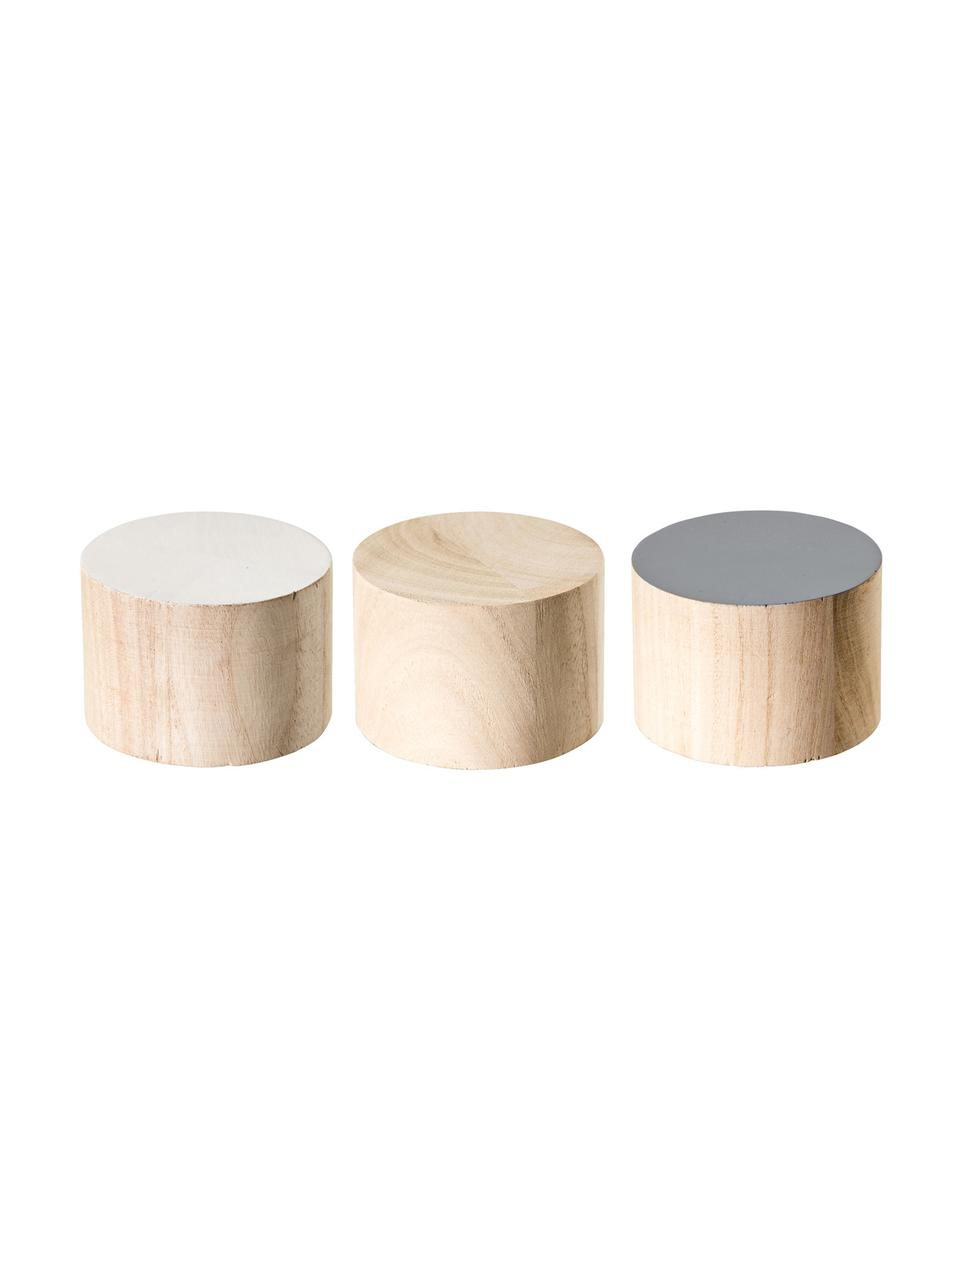 Kleiderhaken-Set Dendi aus Holz, 3-tlg., Paulowniaholz, Braun, Weiß, Grau, Ø 7 x T 5 cm